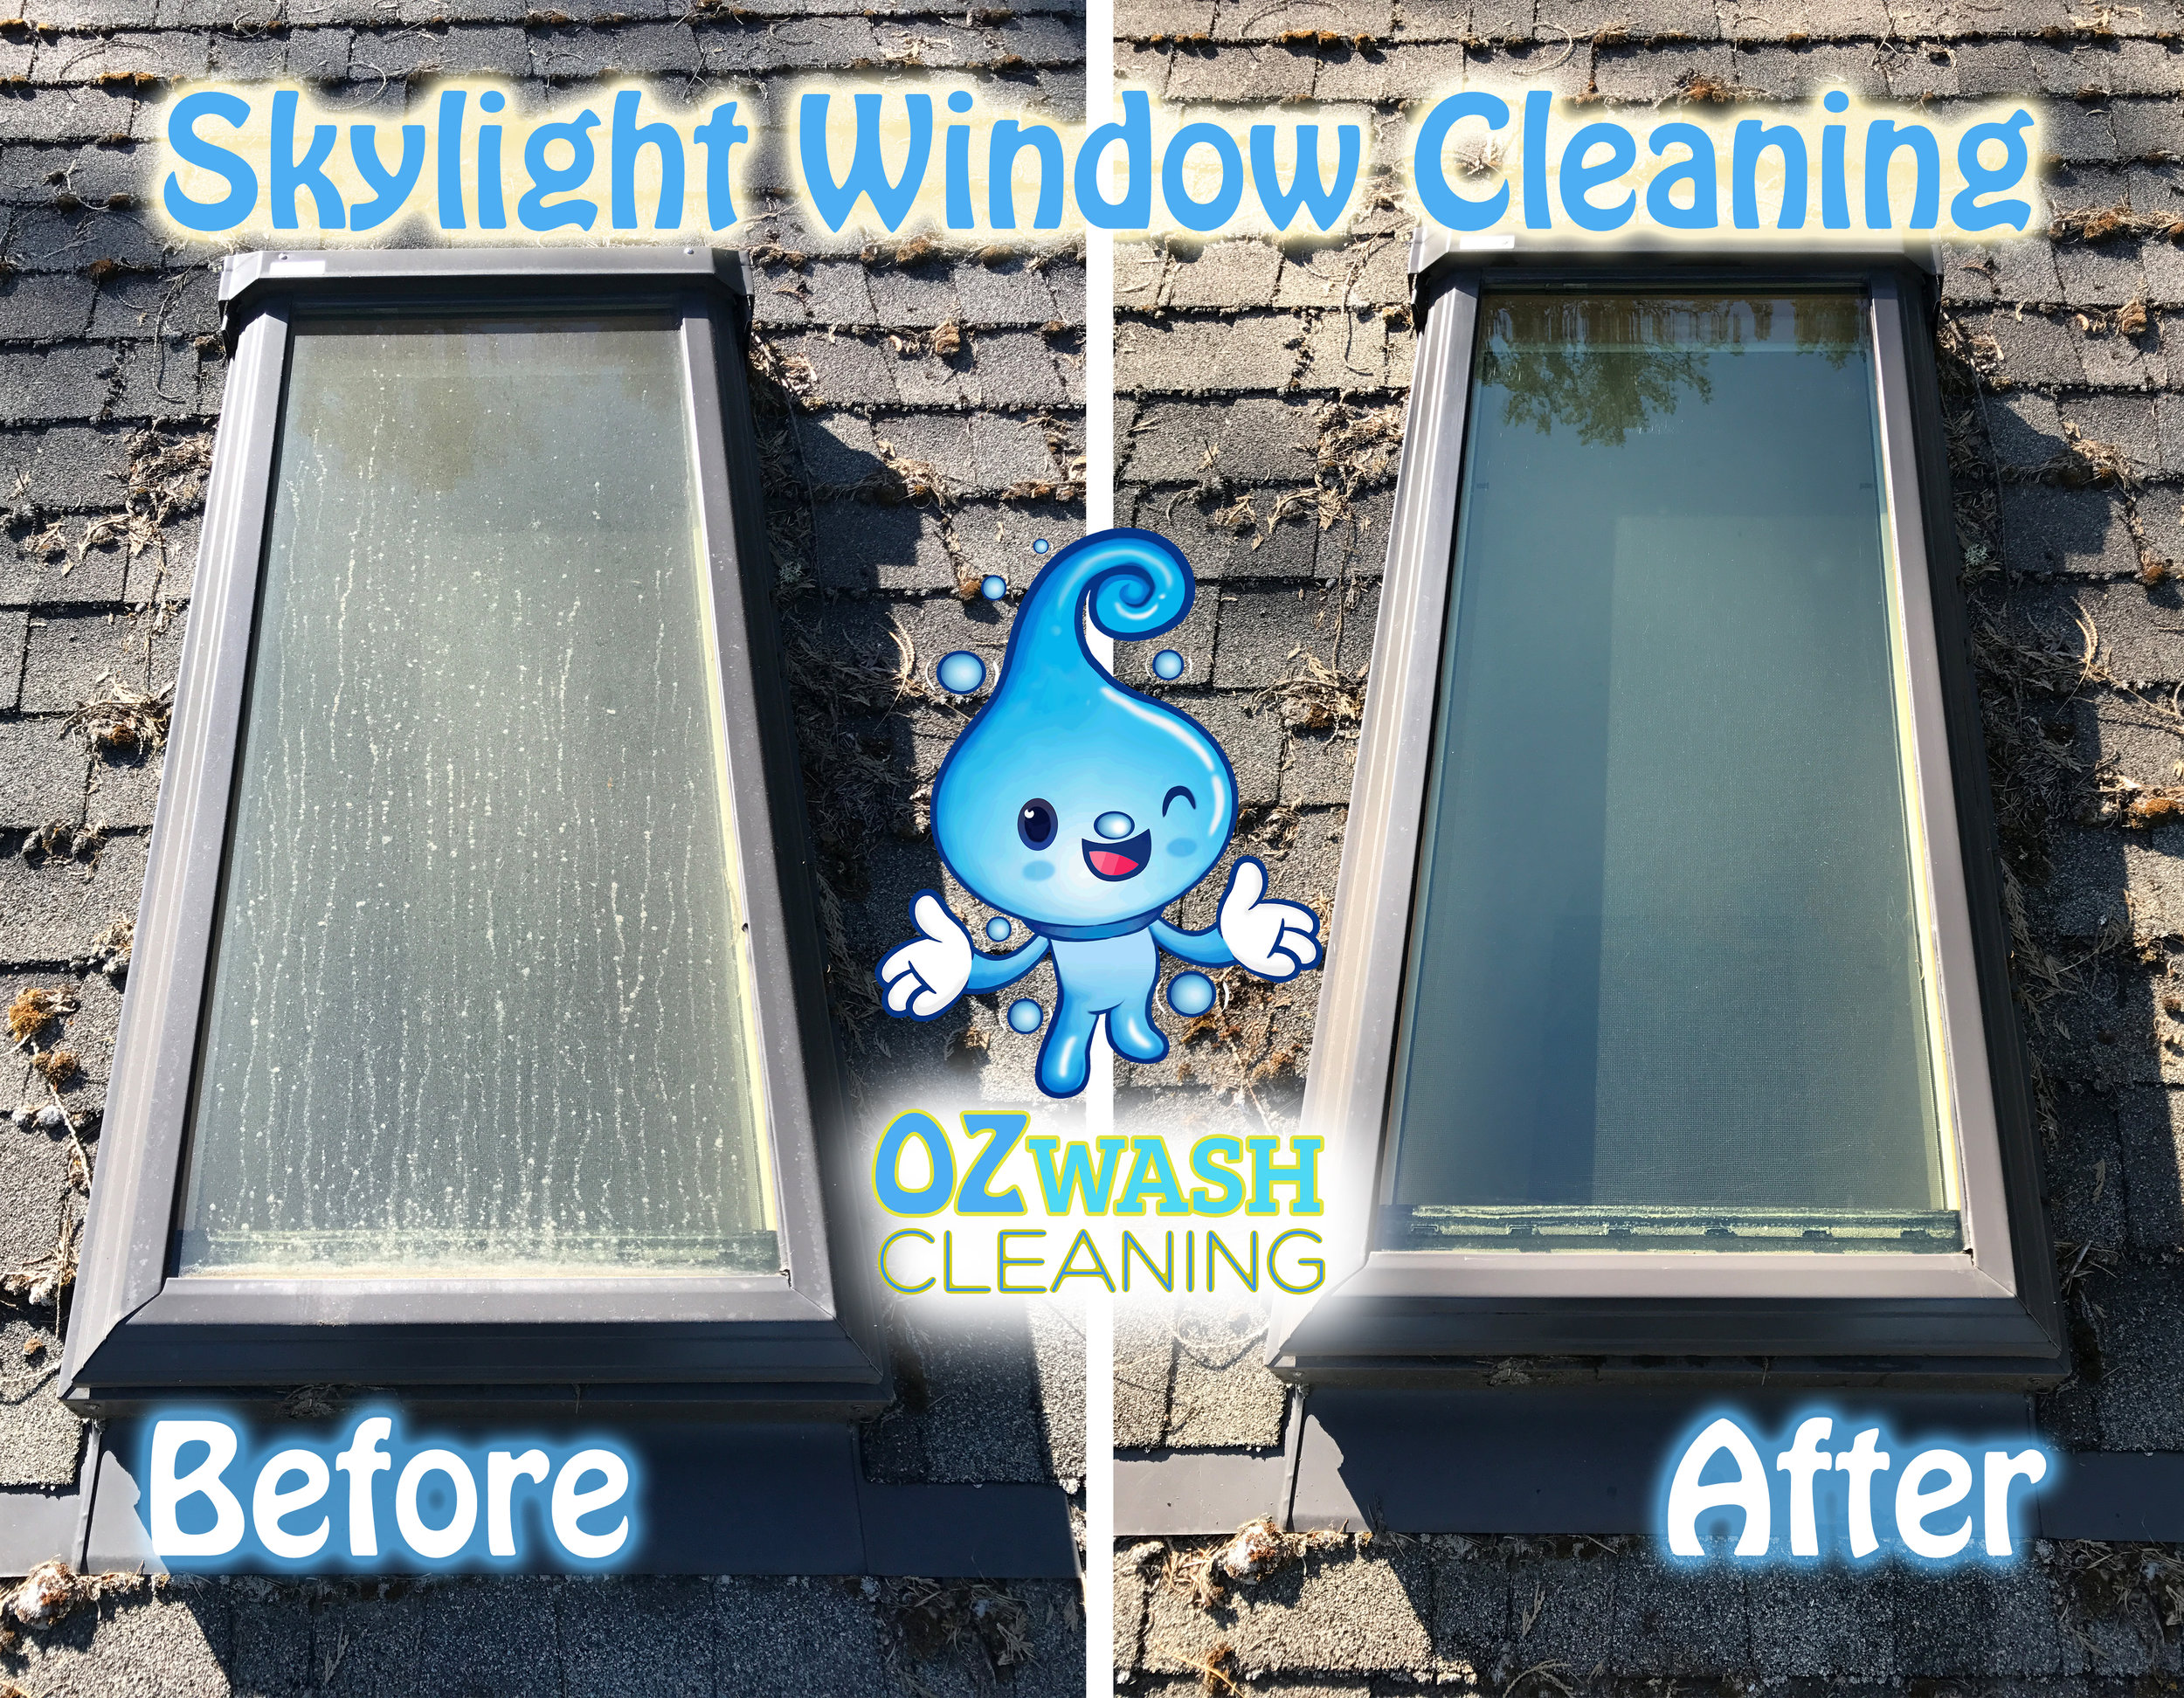 WindowCleaning5.jpg